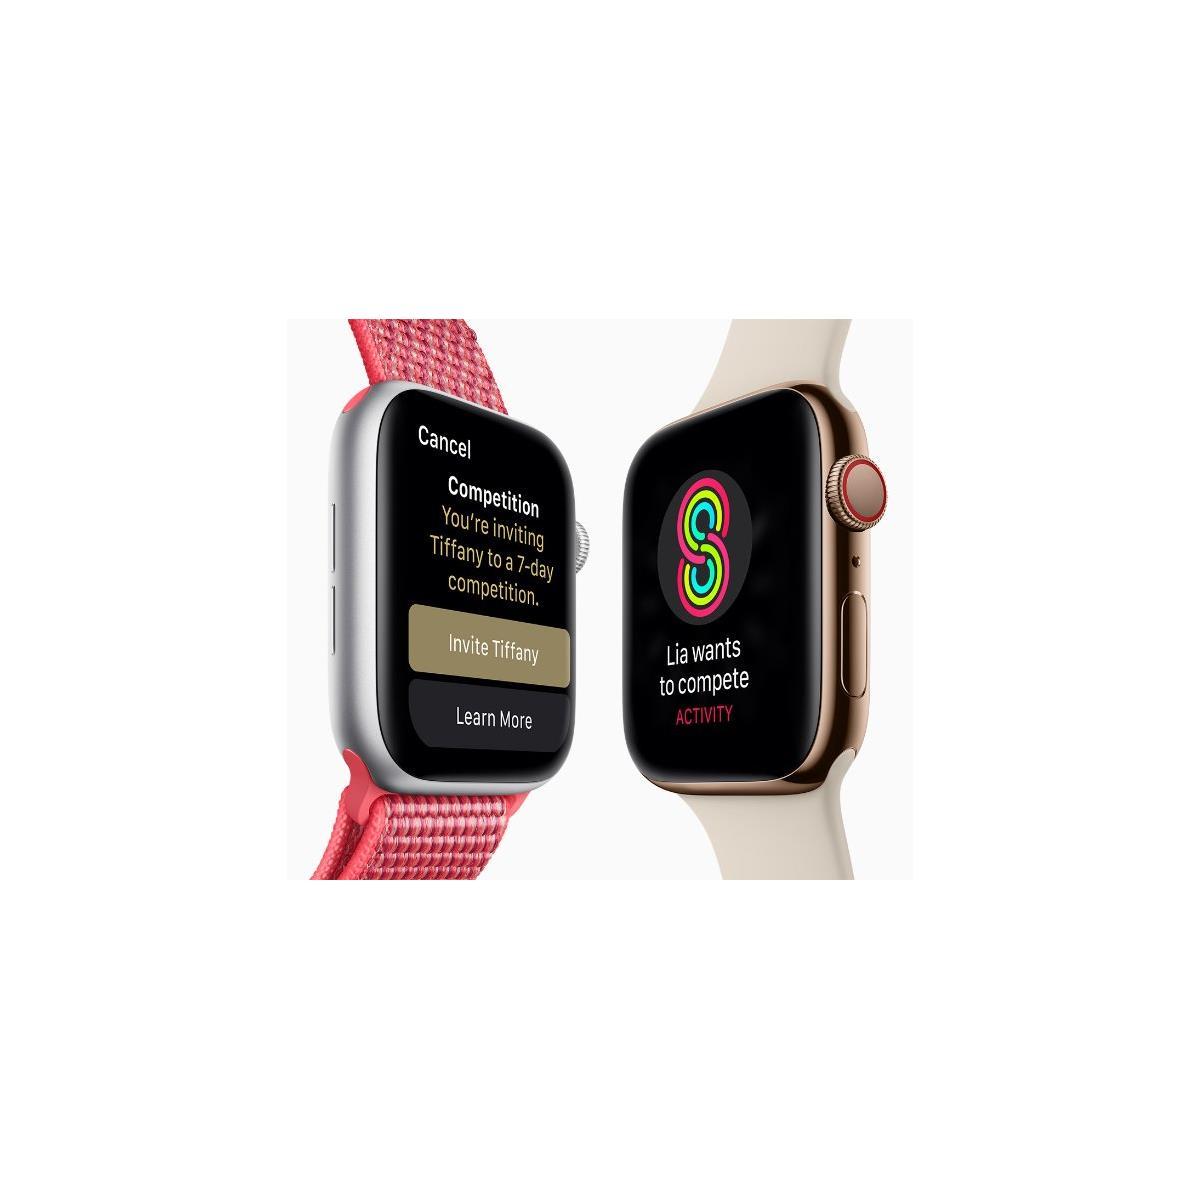 Apple, Fitbit Help Drive 67 Percent Surge In Q3 Smartwatch Shipments